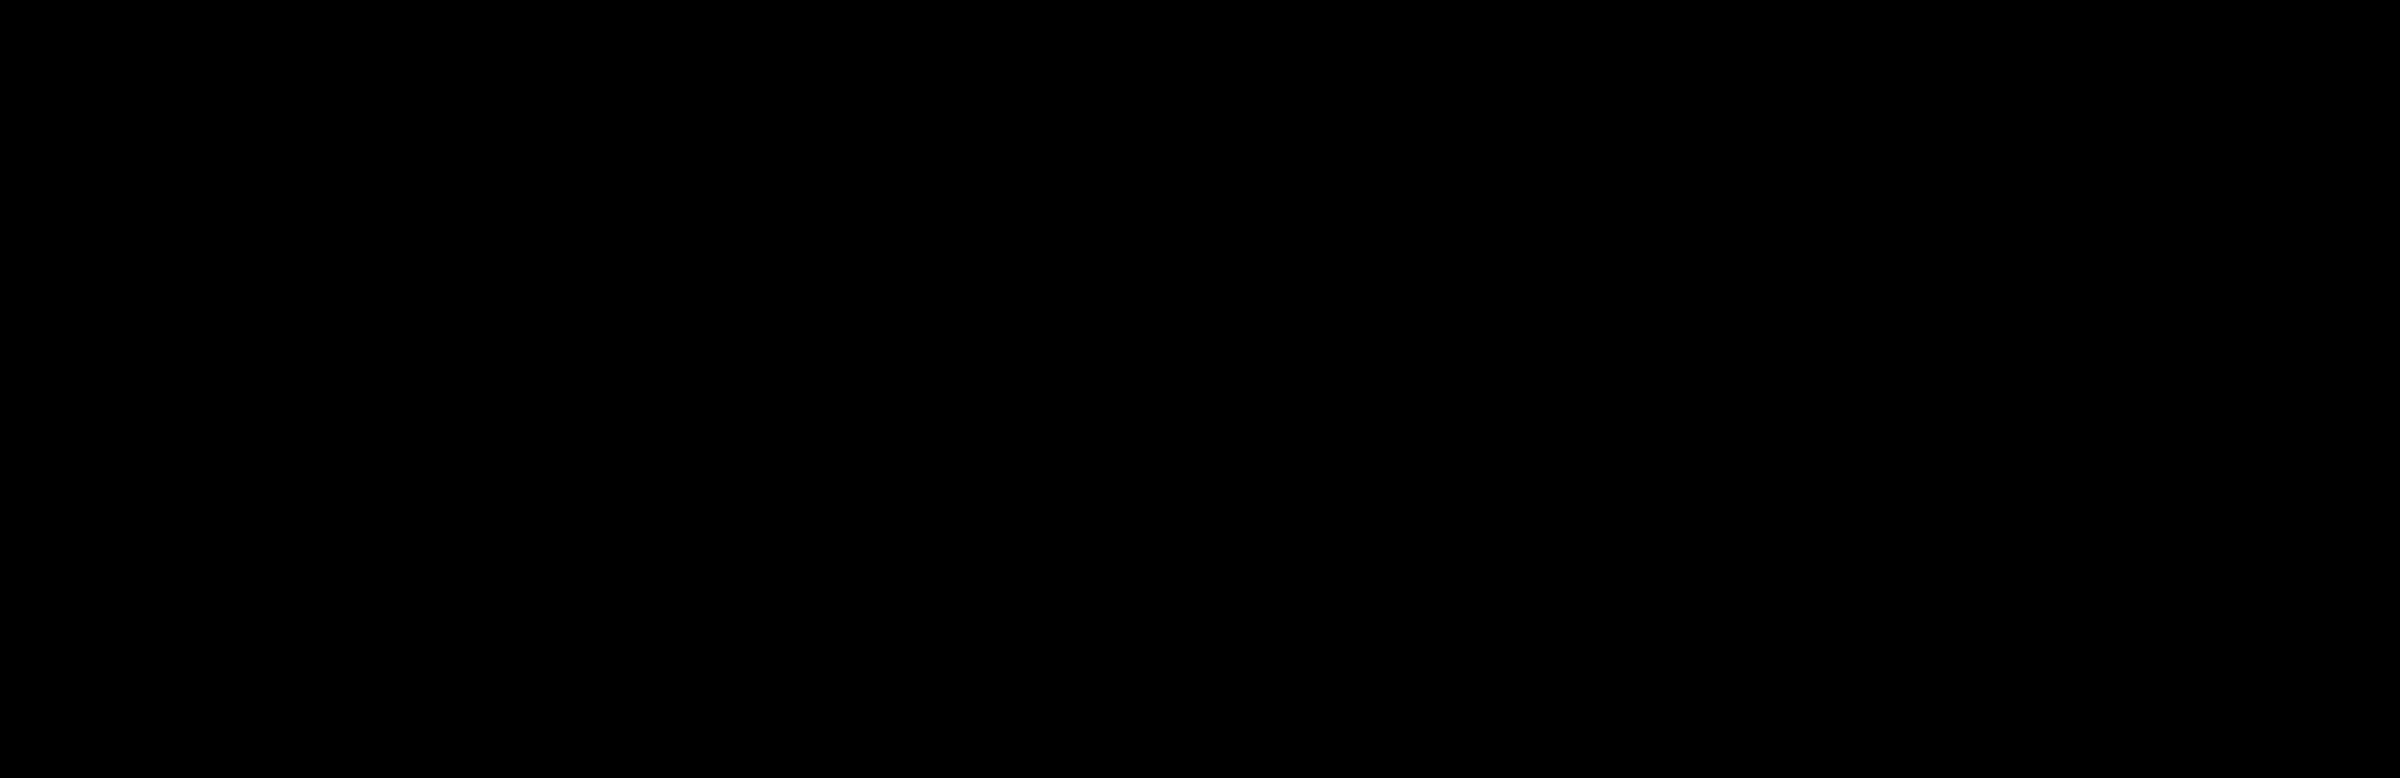 Lock clipart transparent. Simple key big image